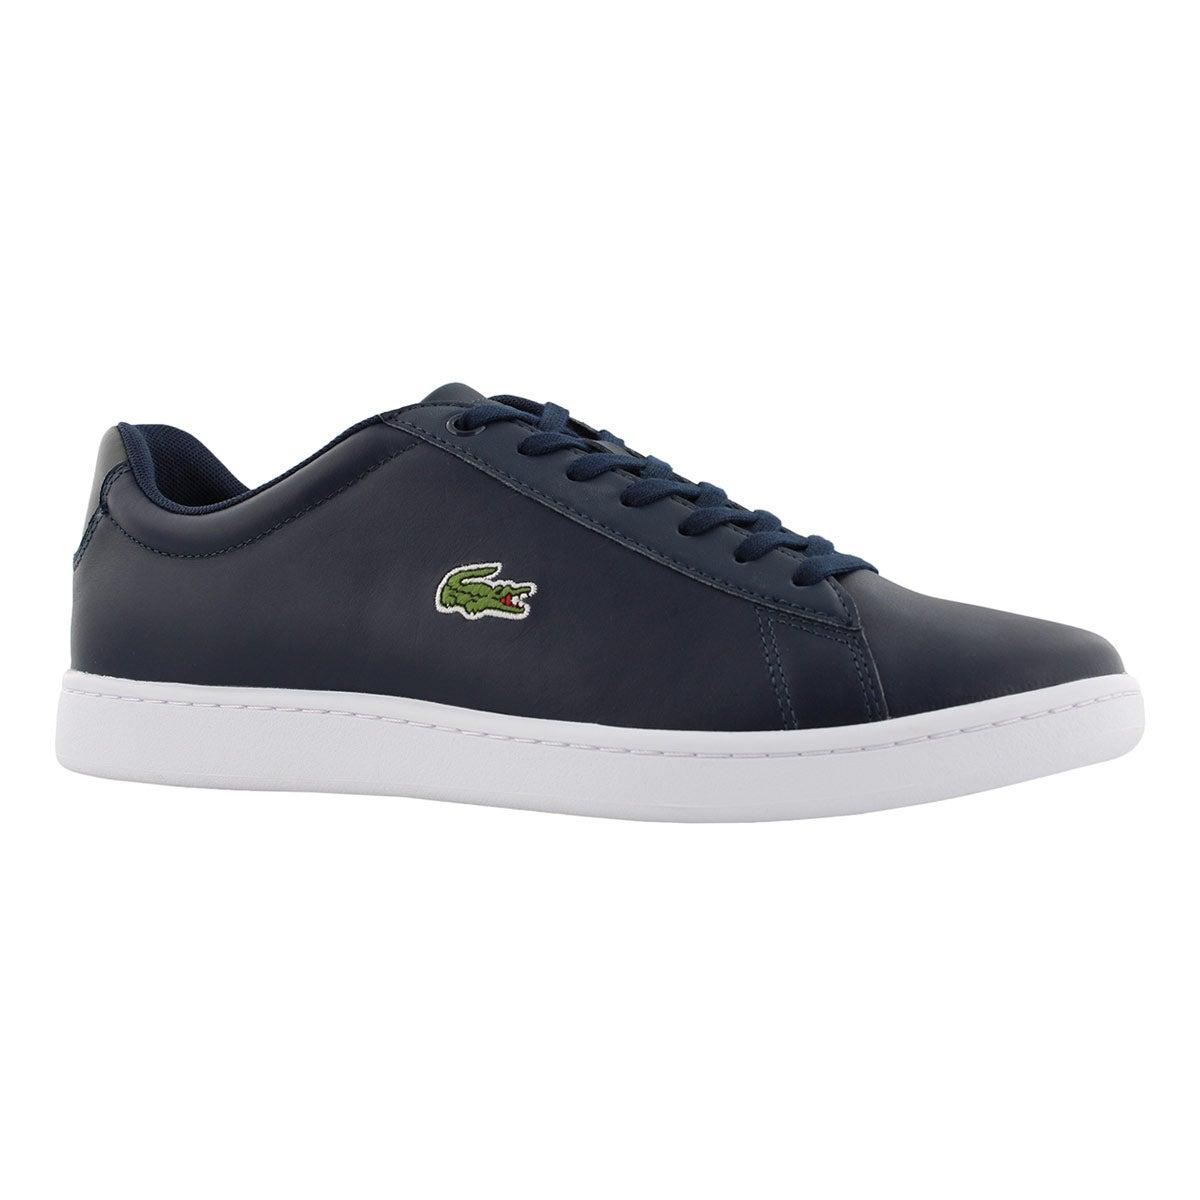 Men's HYDEZ 318 1 P white/black sneake